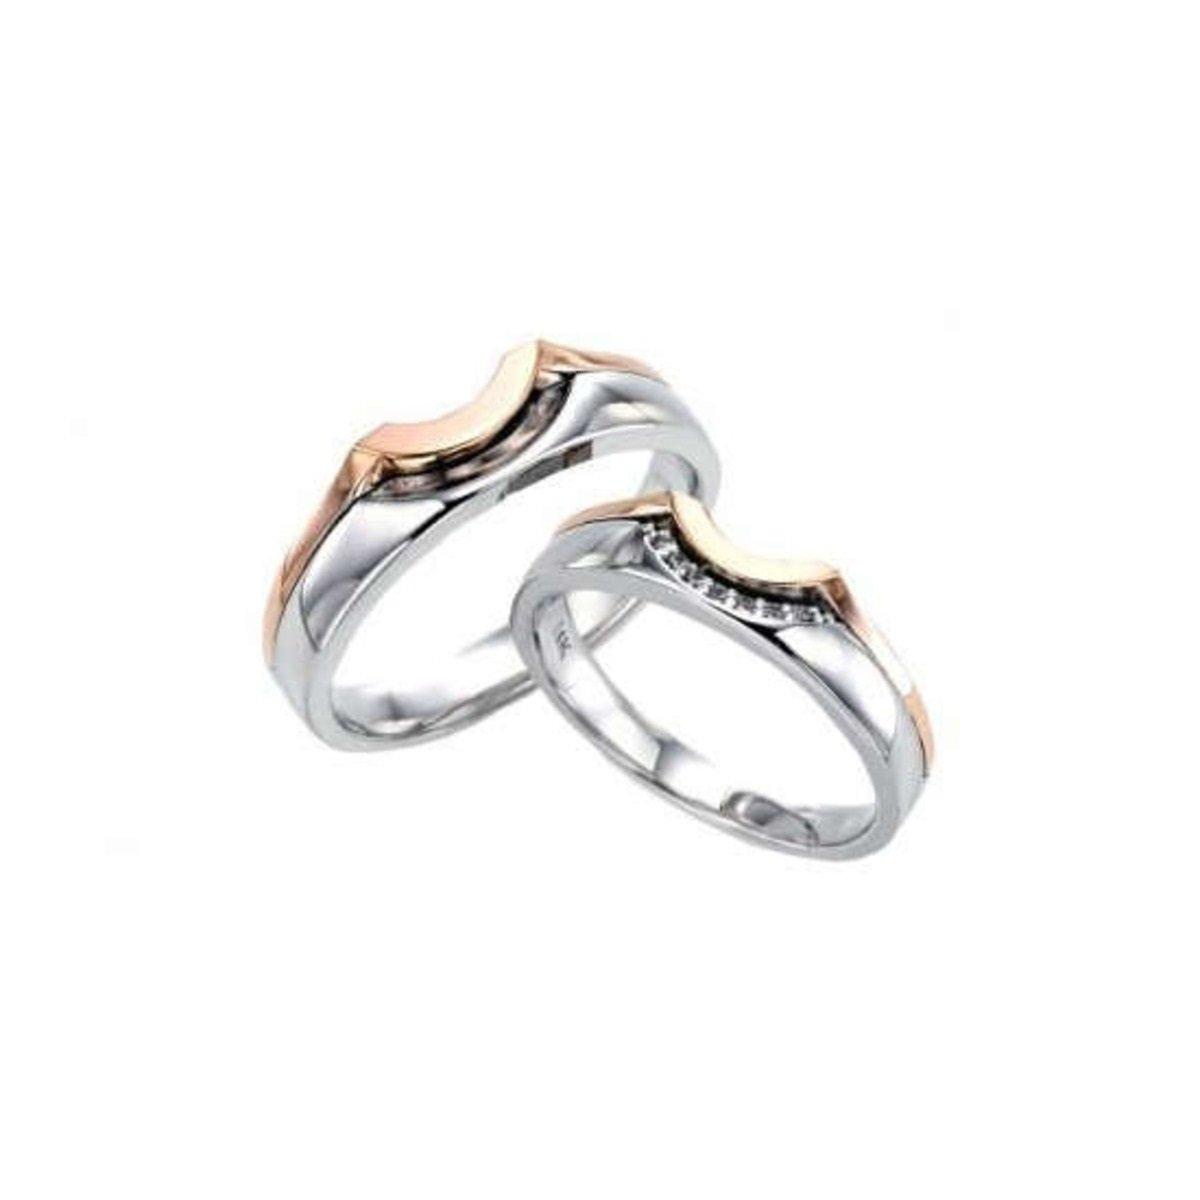 14K 雙色彎紋情侶戒指 (女款)